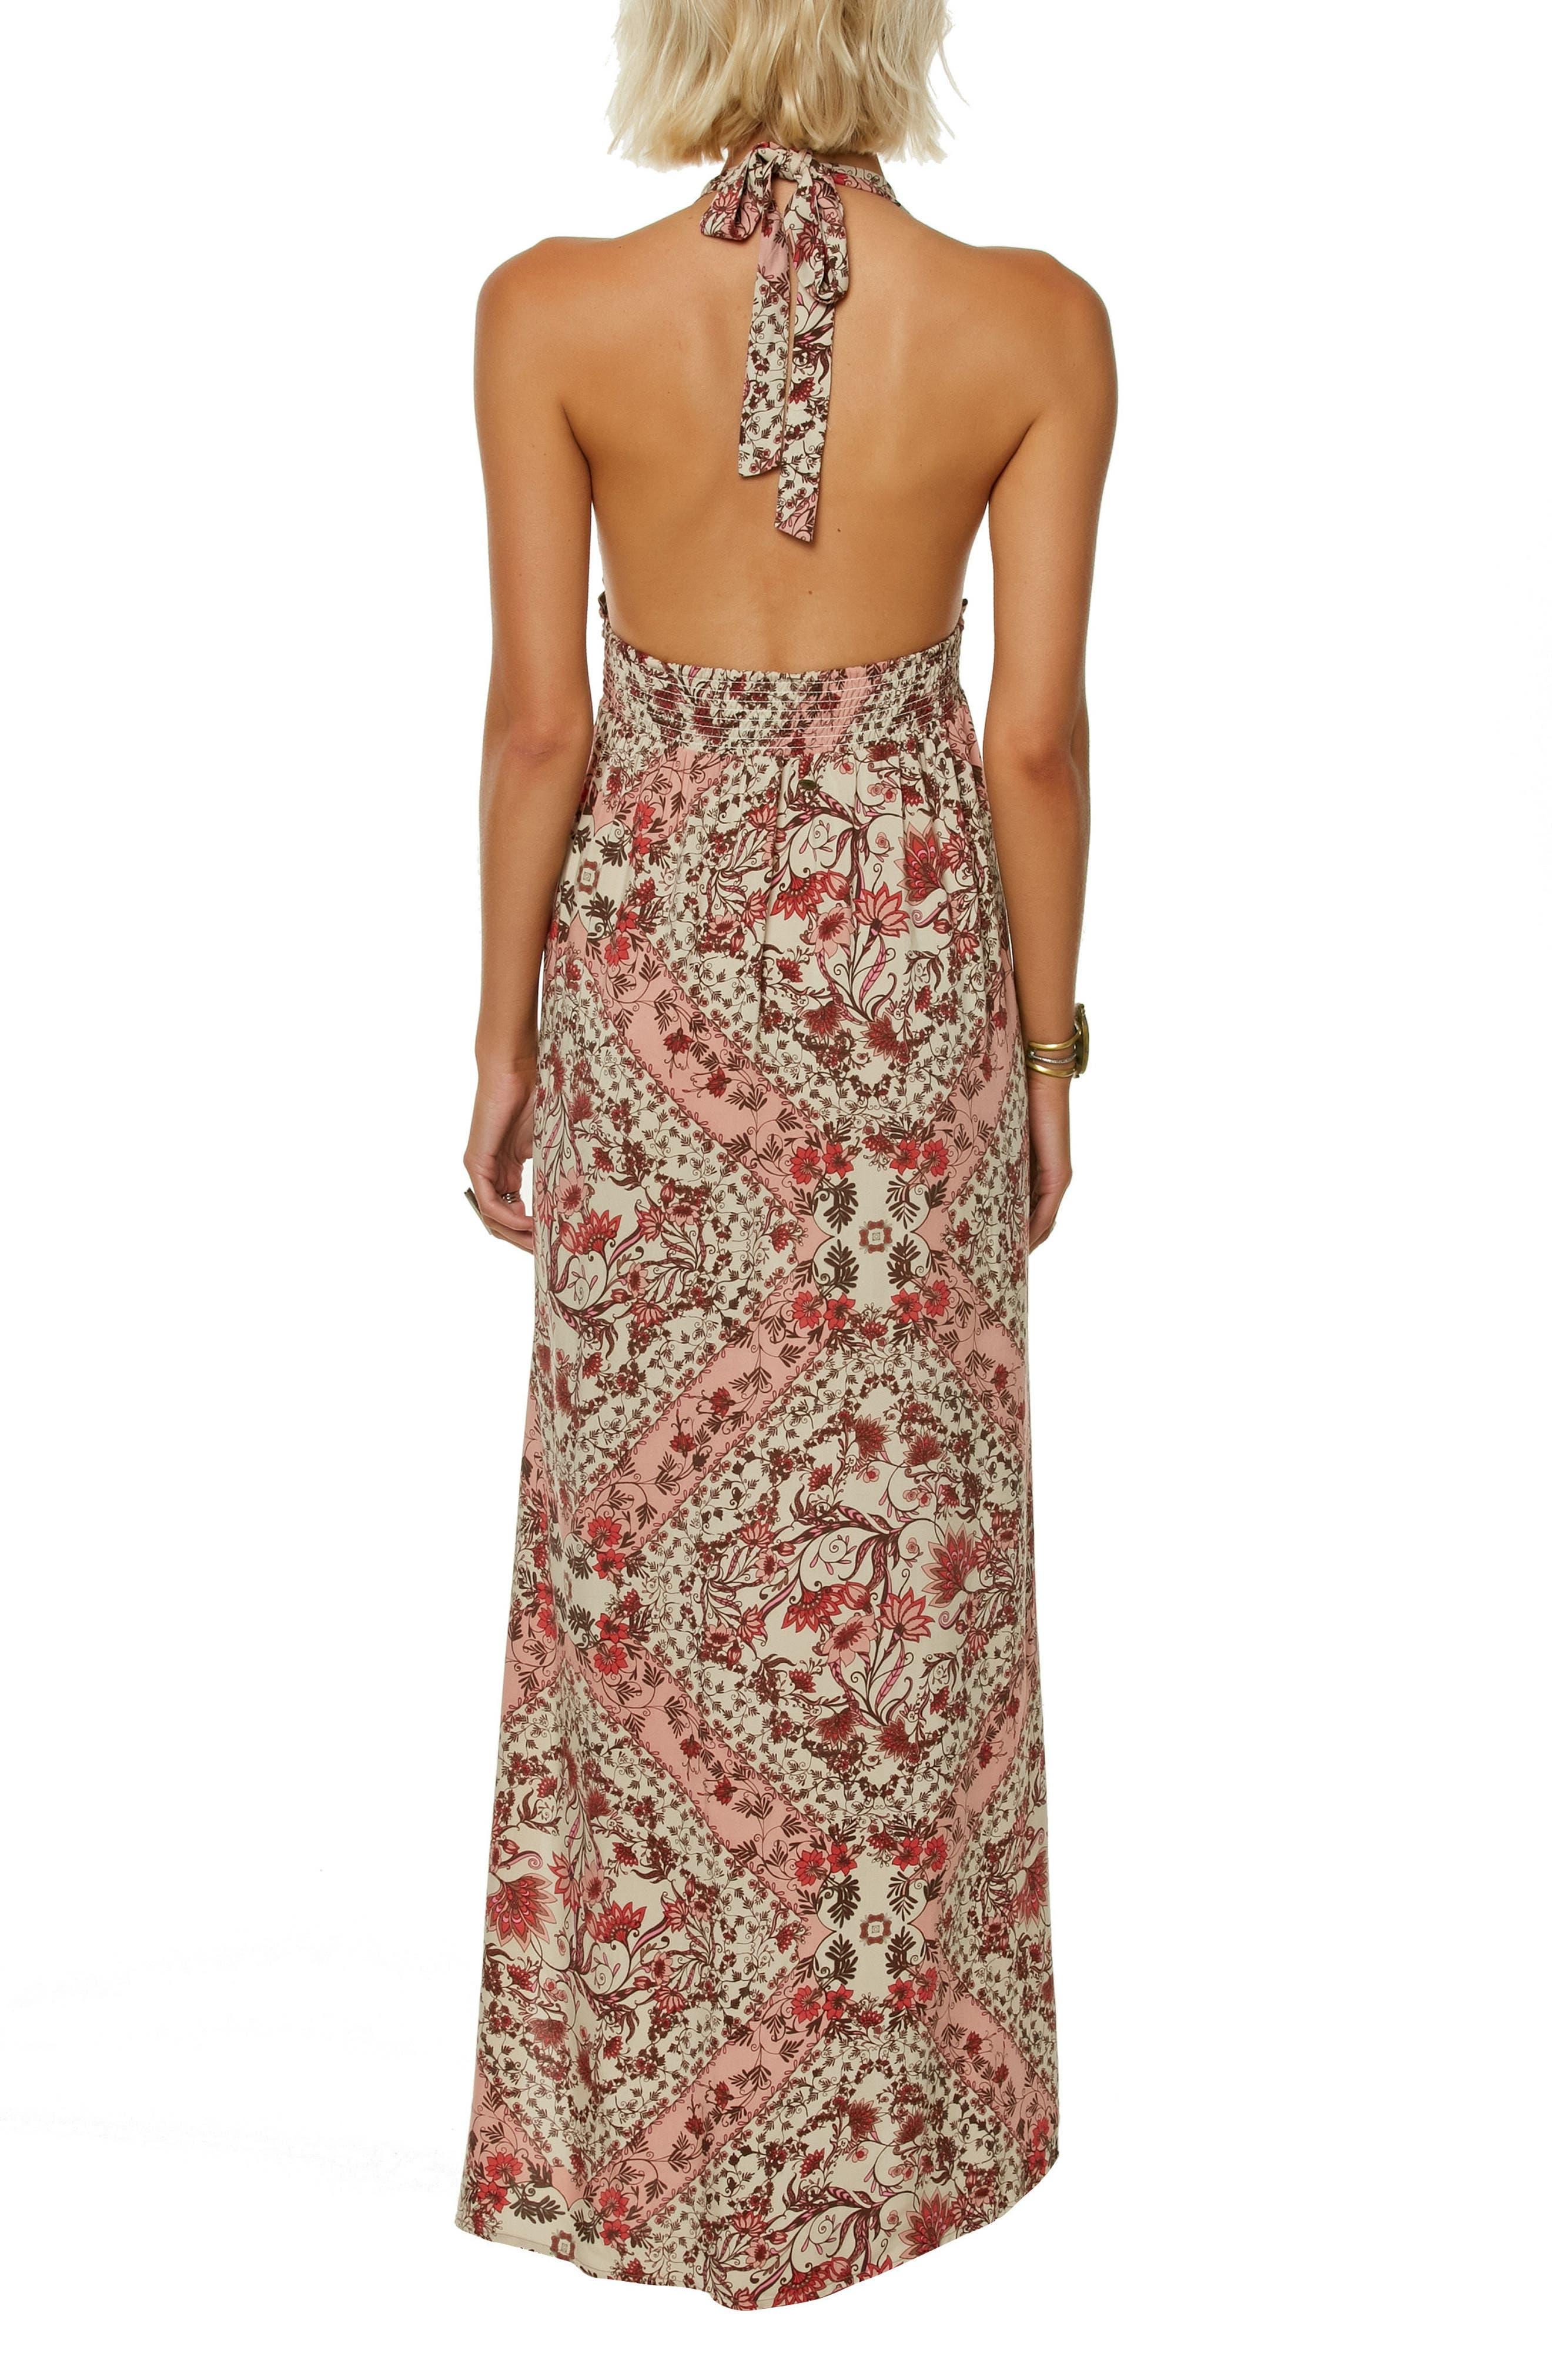 Dolley Halter Neck Maxi Dress,                             Alternate thumbnail 2, color,                             694